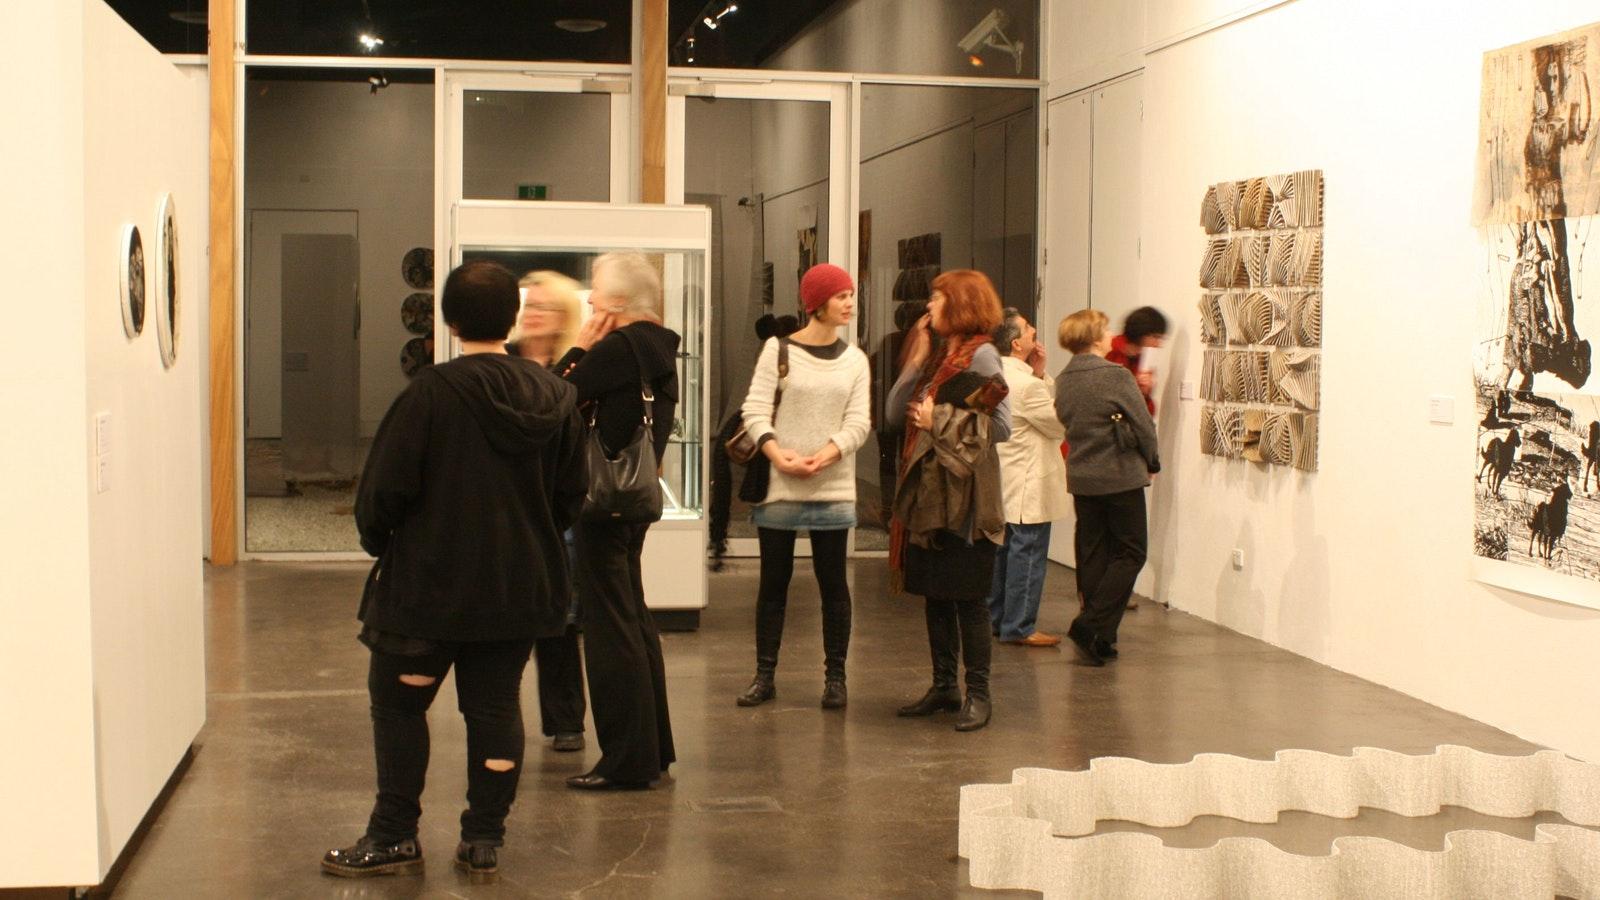 Exploring art and culture at the Latrobe Regional Gallery, Morwell, Victoria, Australia